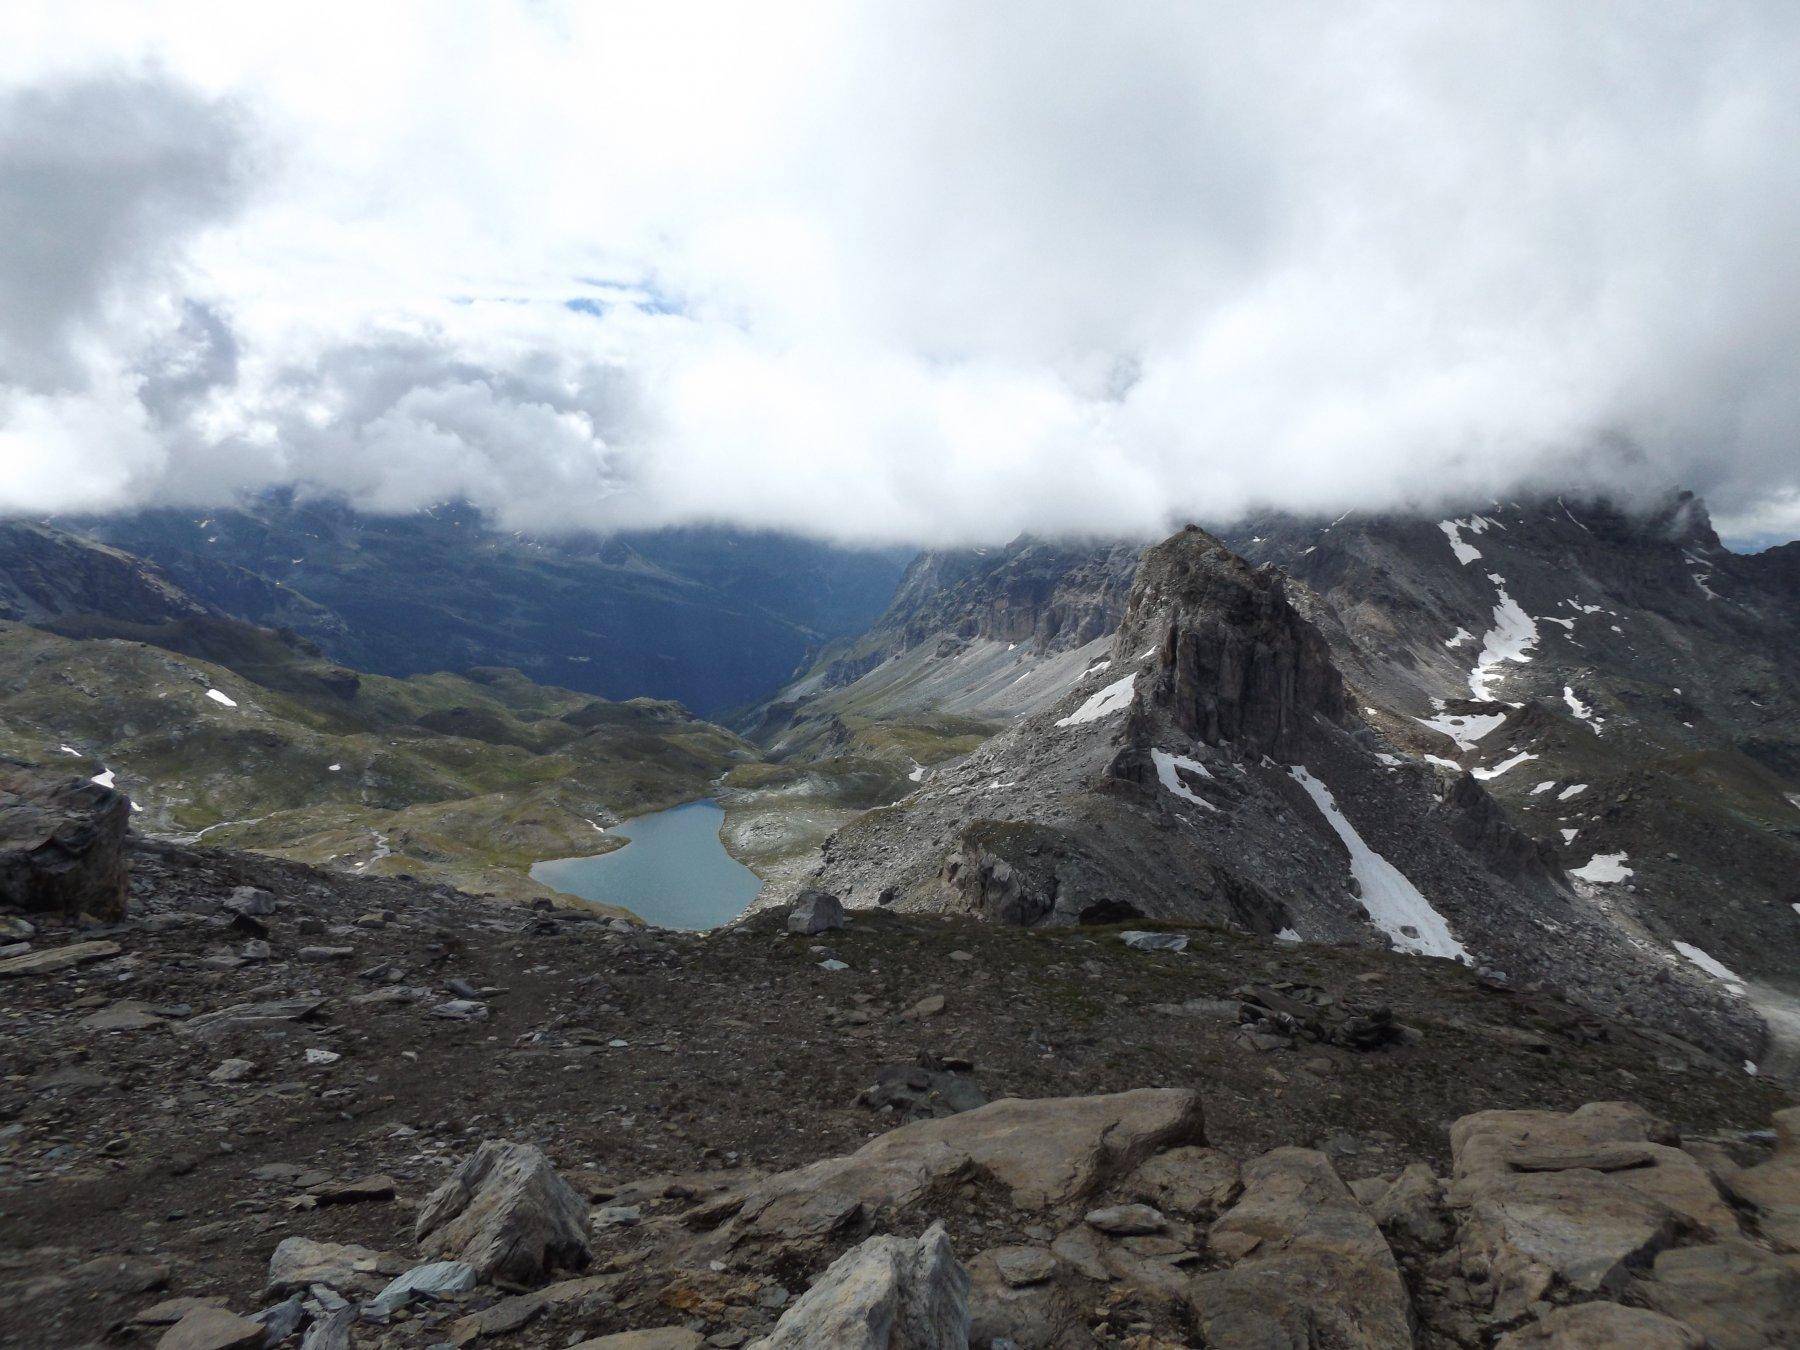 Panorama verso il colle ed i laghi